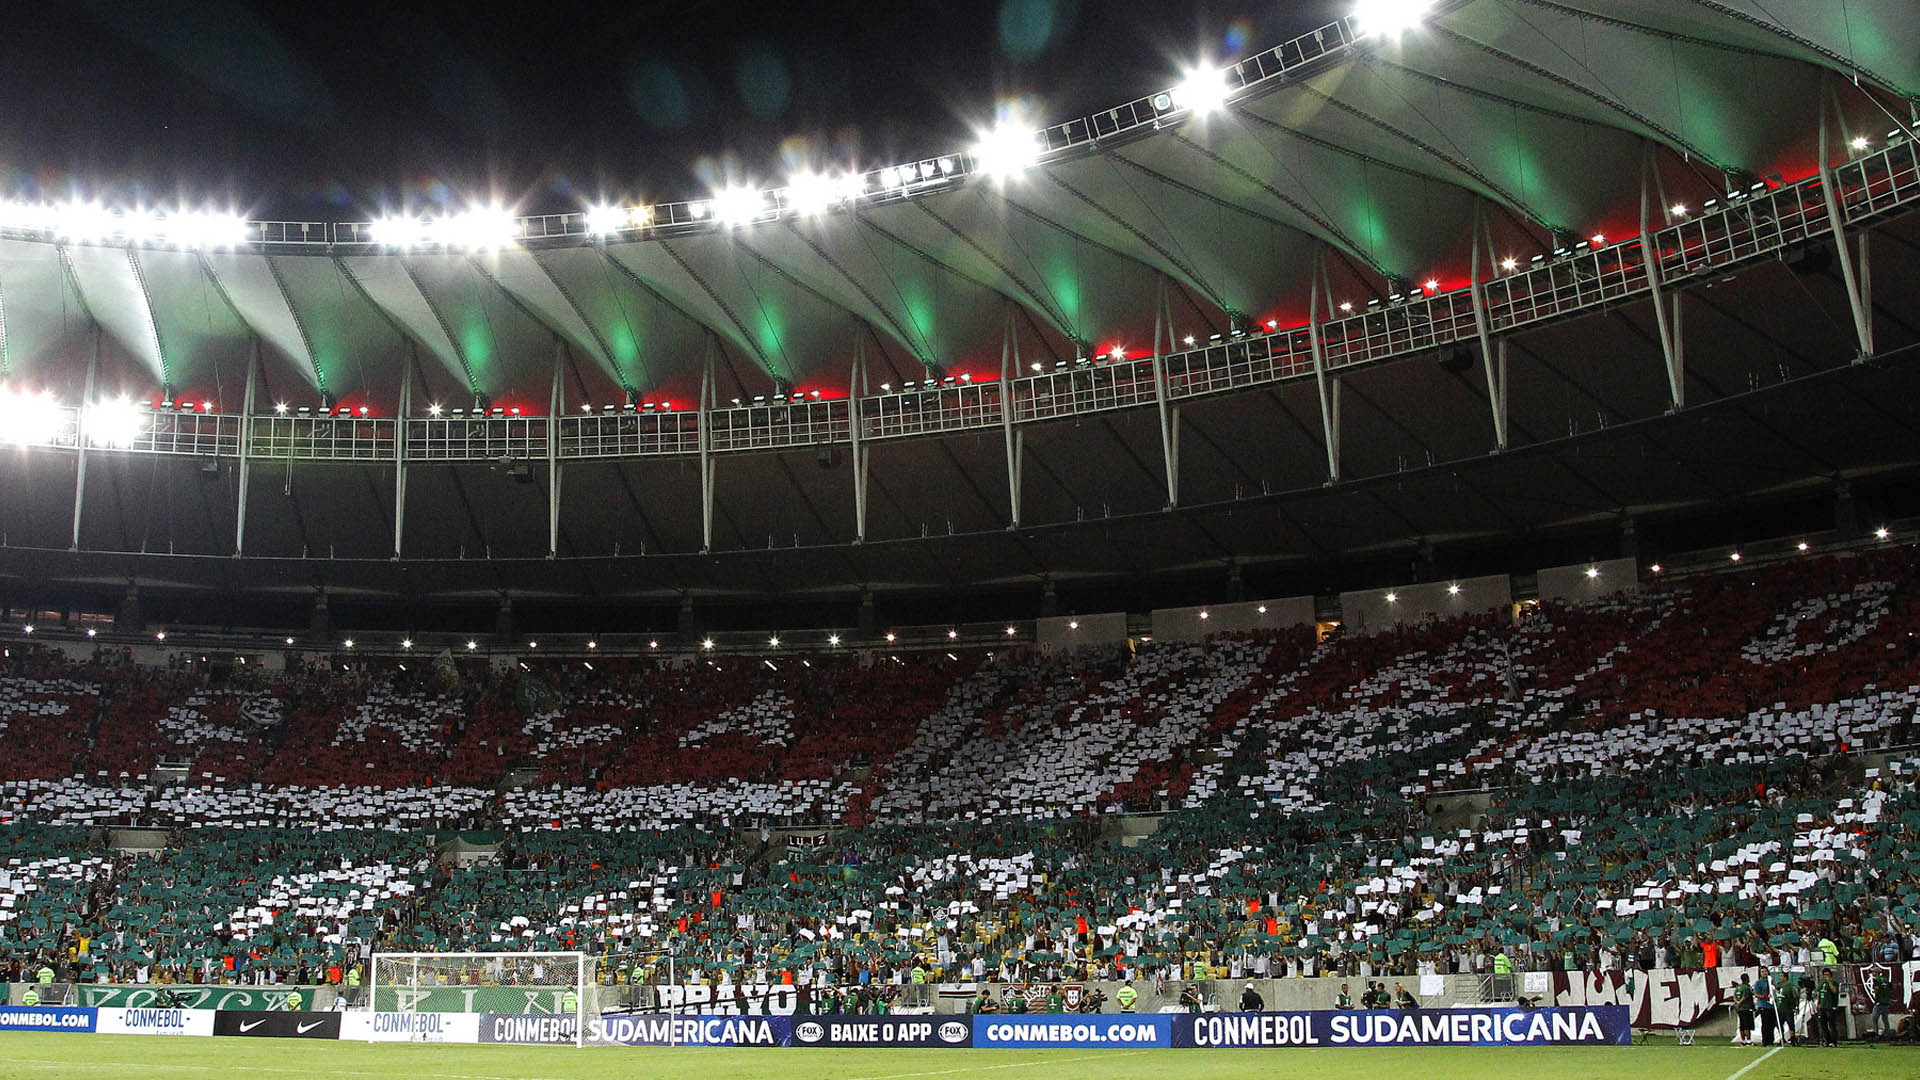 Mosaico Fluminense Maracanã Copa Sul Americana 05 04 17